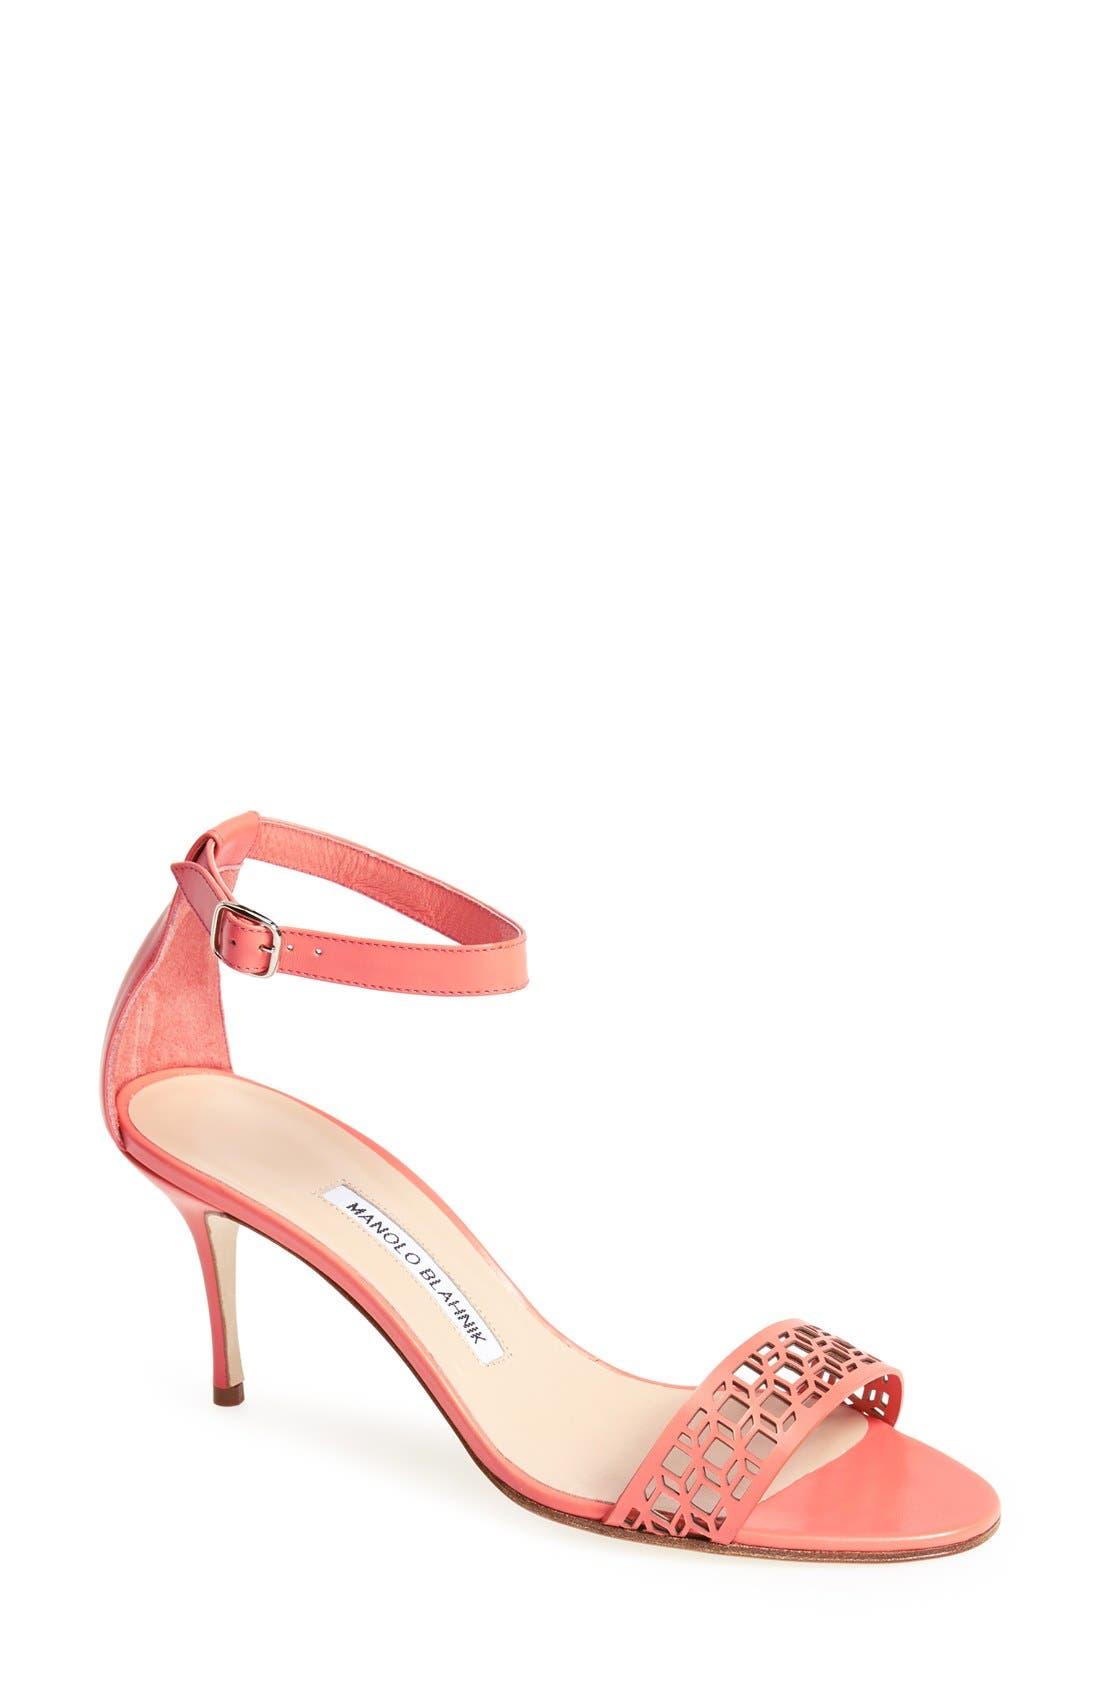 Main Image - Manolo Blahnik 'Maurila' Leather Ankle Strap Sandal (Women)